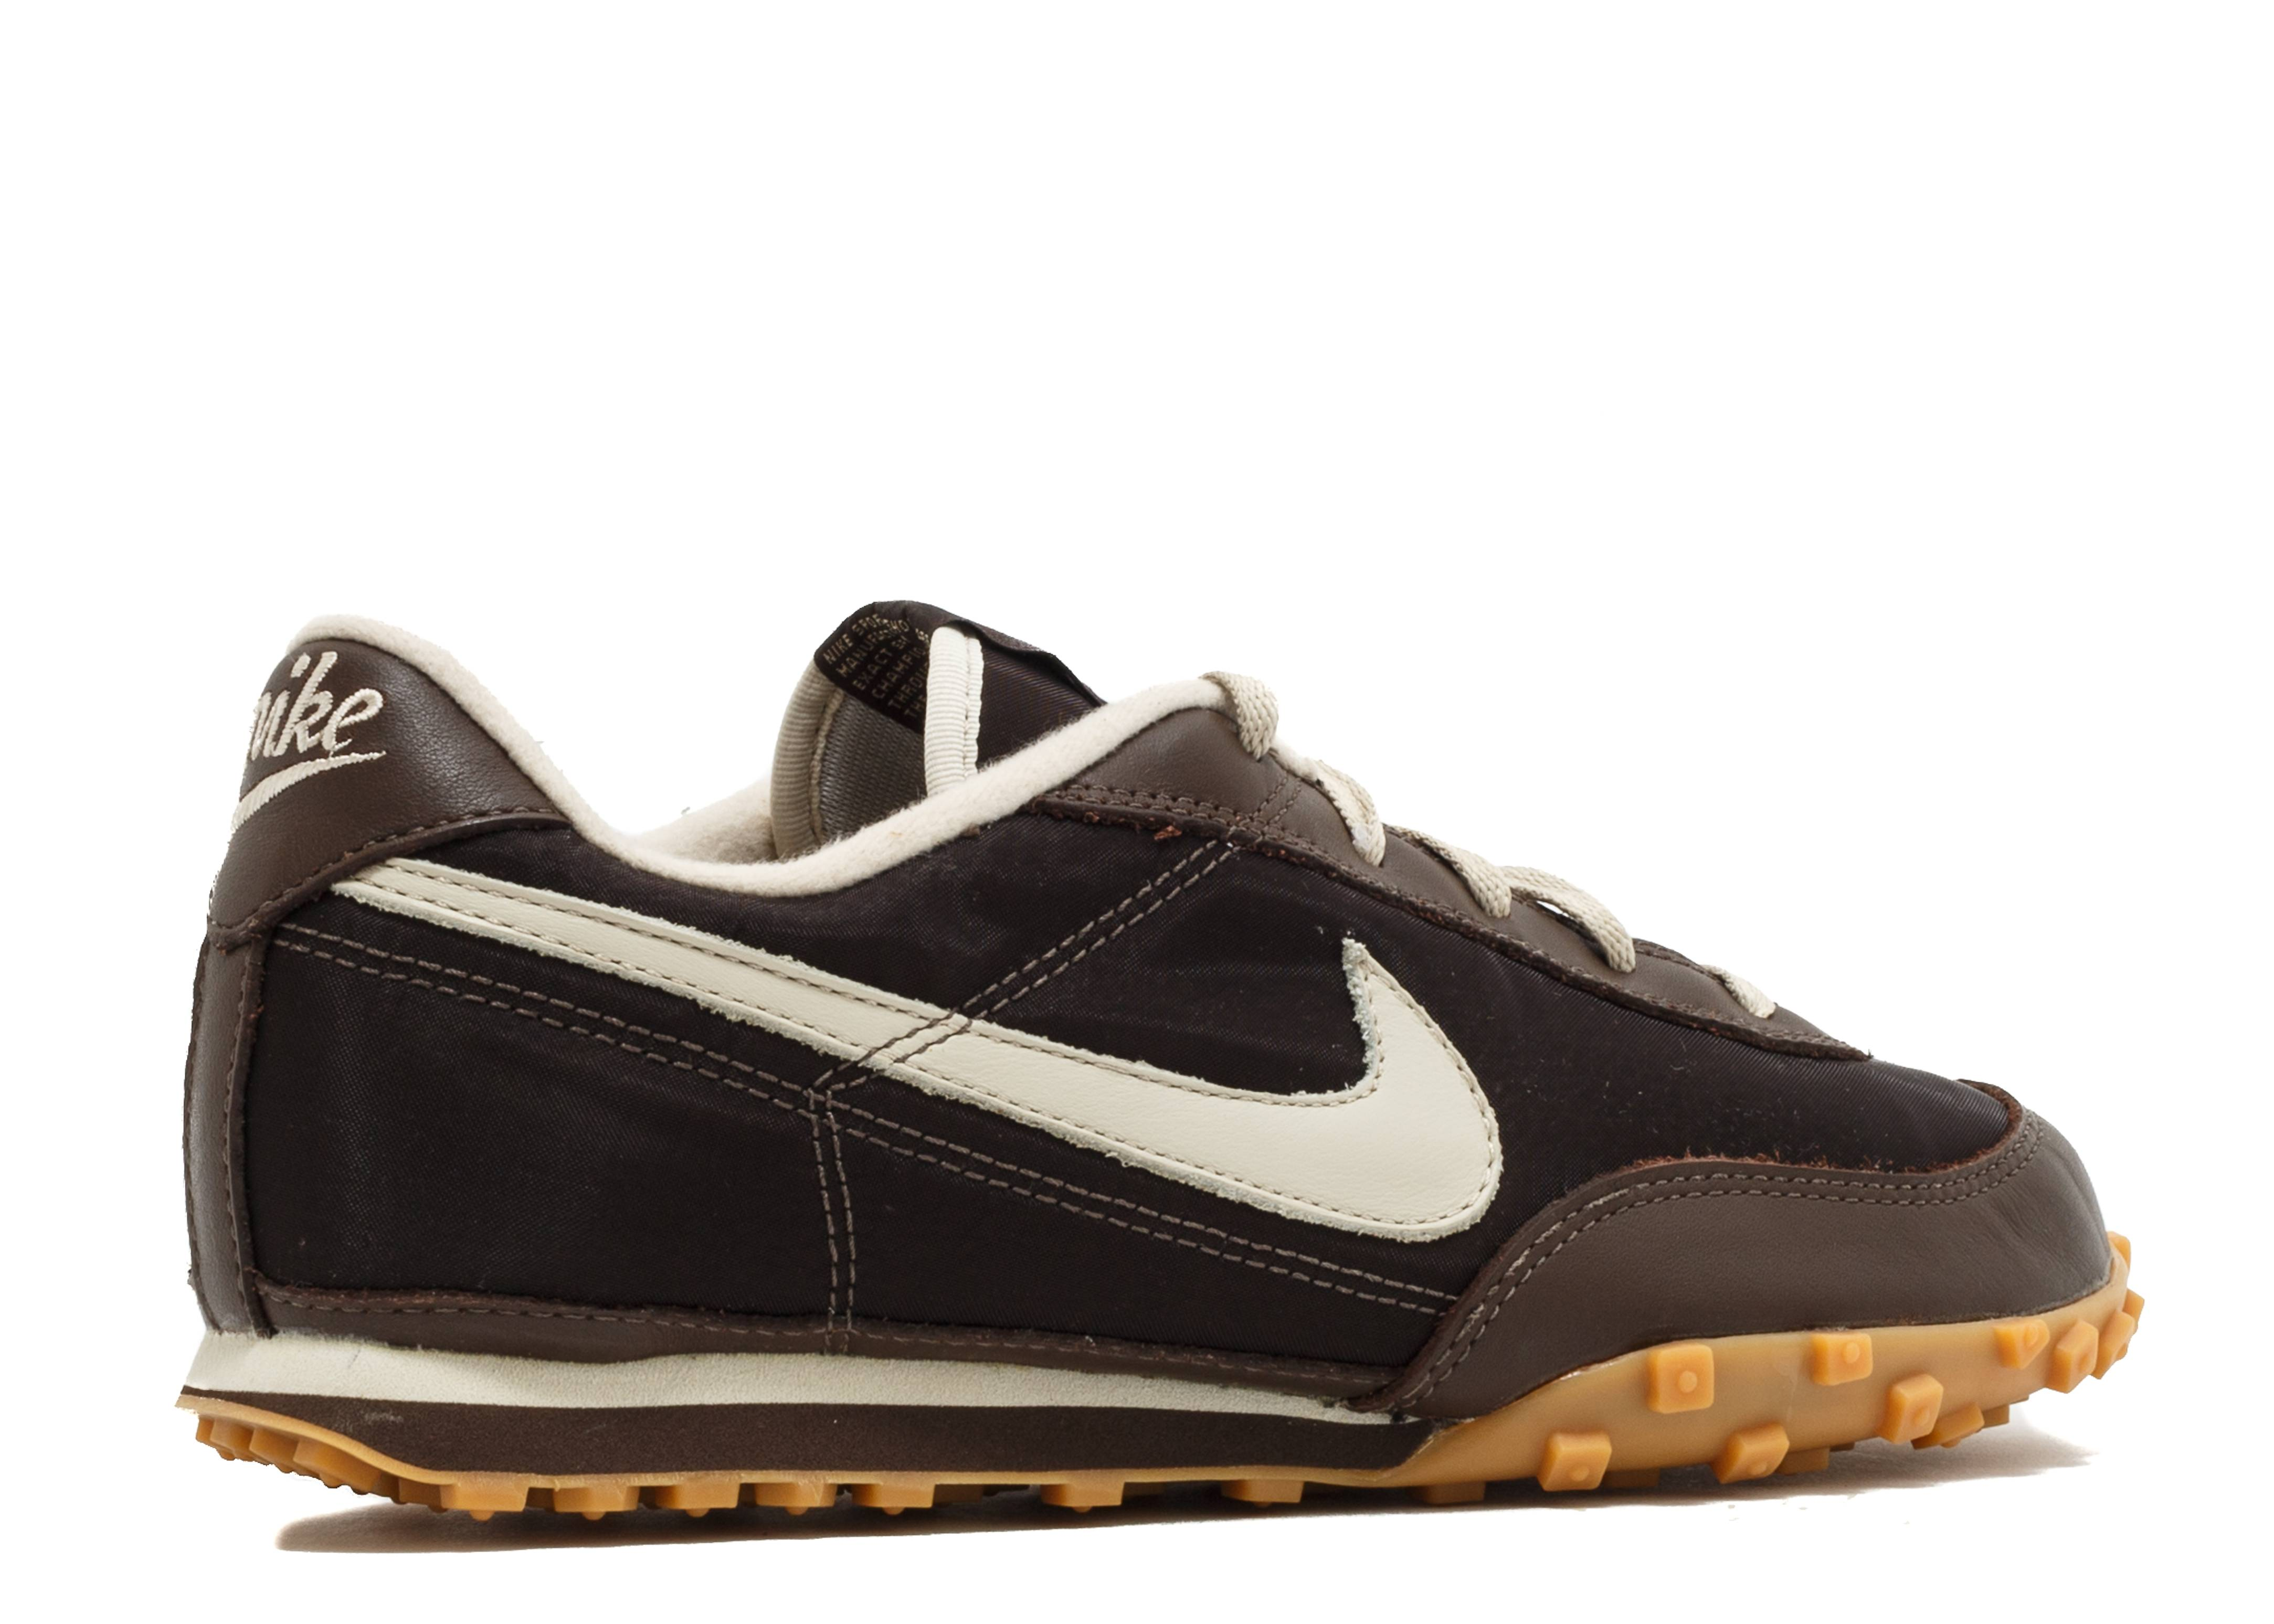 sports shoes 8e70f 4b3c9 Waffle Racer 2 - Nike - 303918 212 - baroque brn net   Flight Club